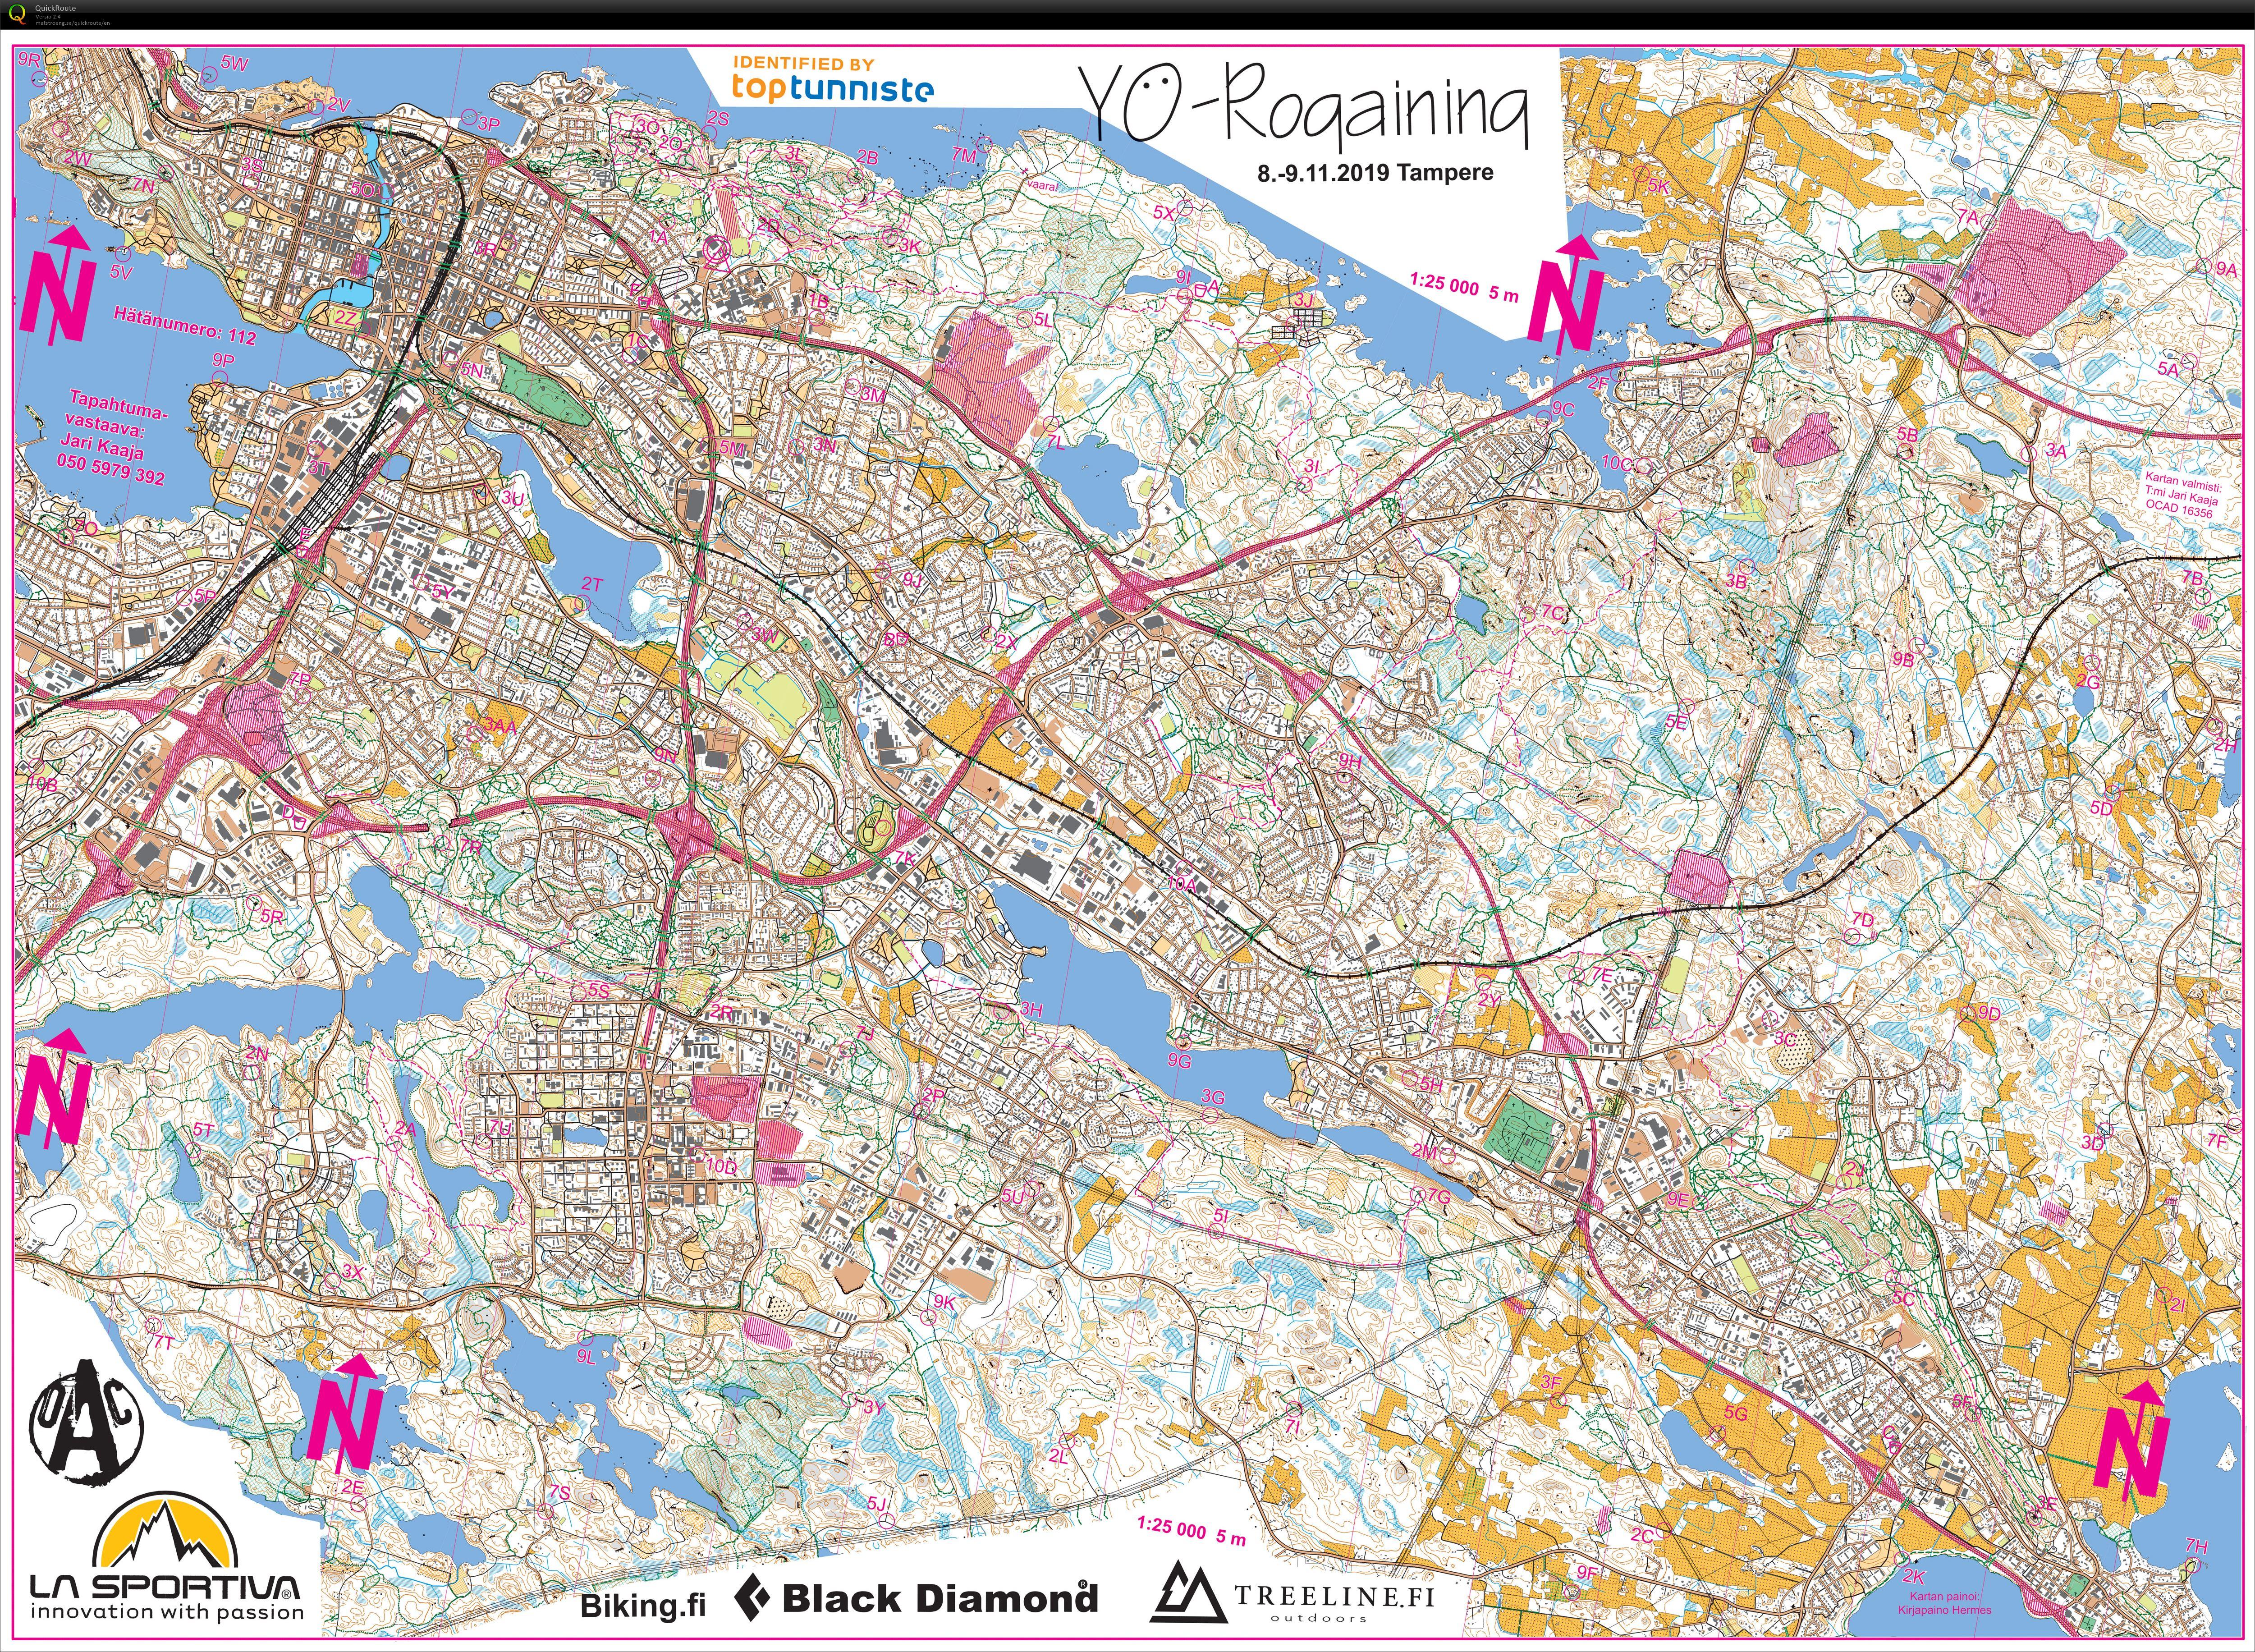 Yo Rogaining Tampere November 8th 2019 Orienteering Map From